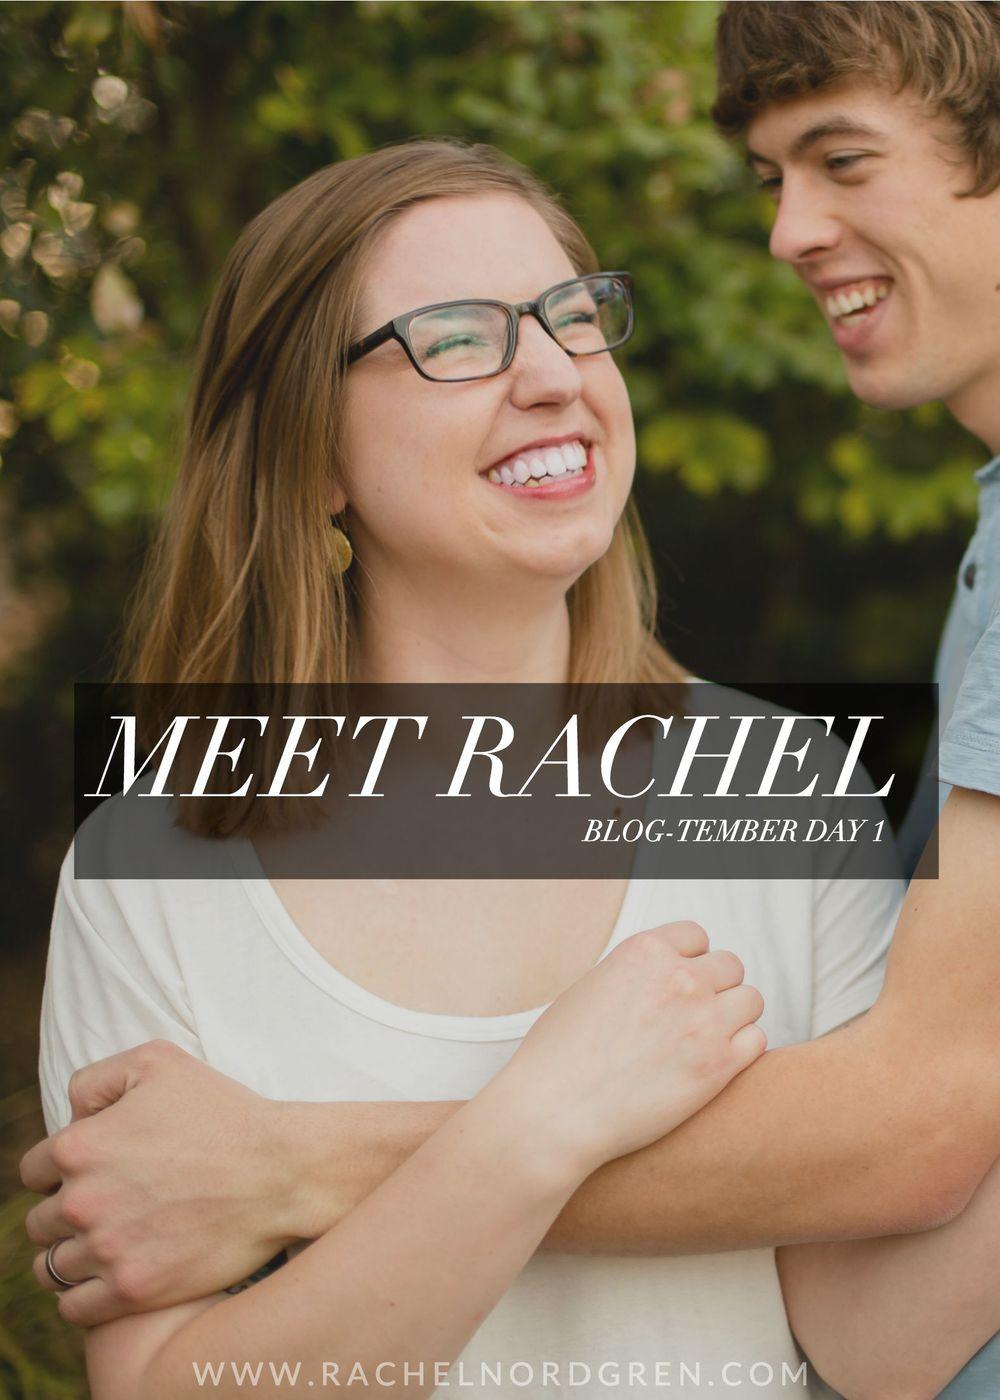 Blog-tember-1-meet-Rachel.jpg